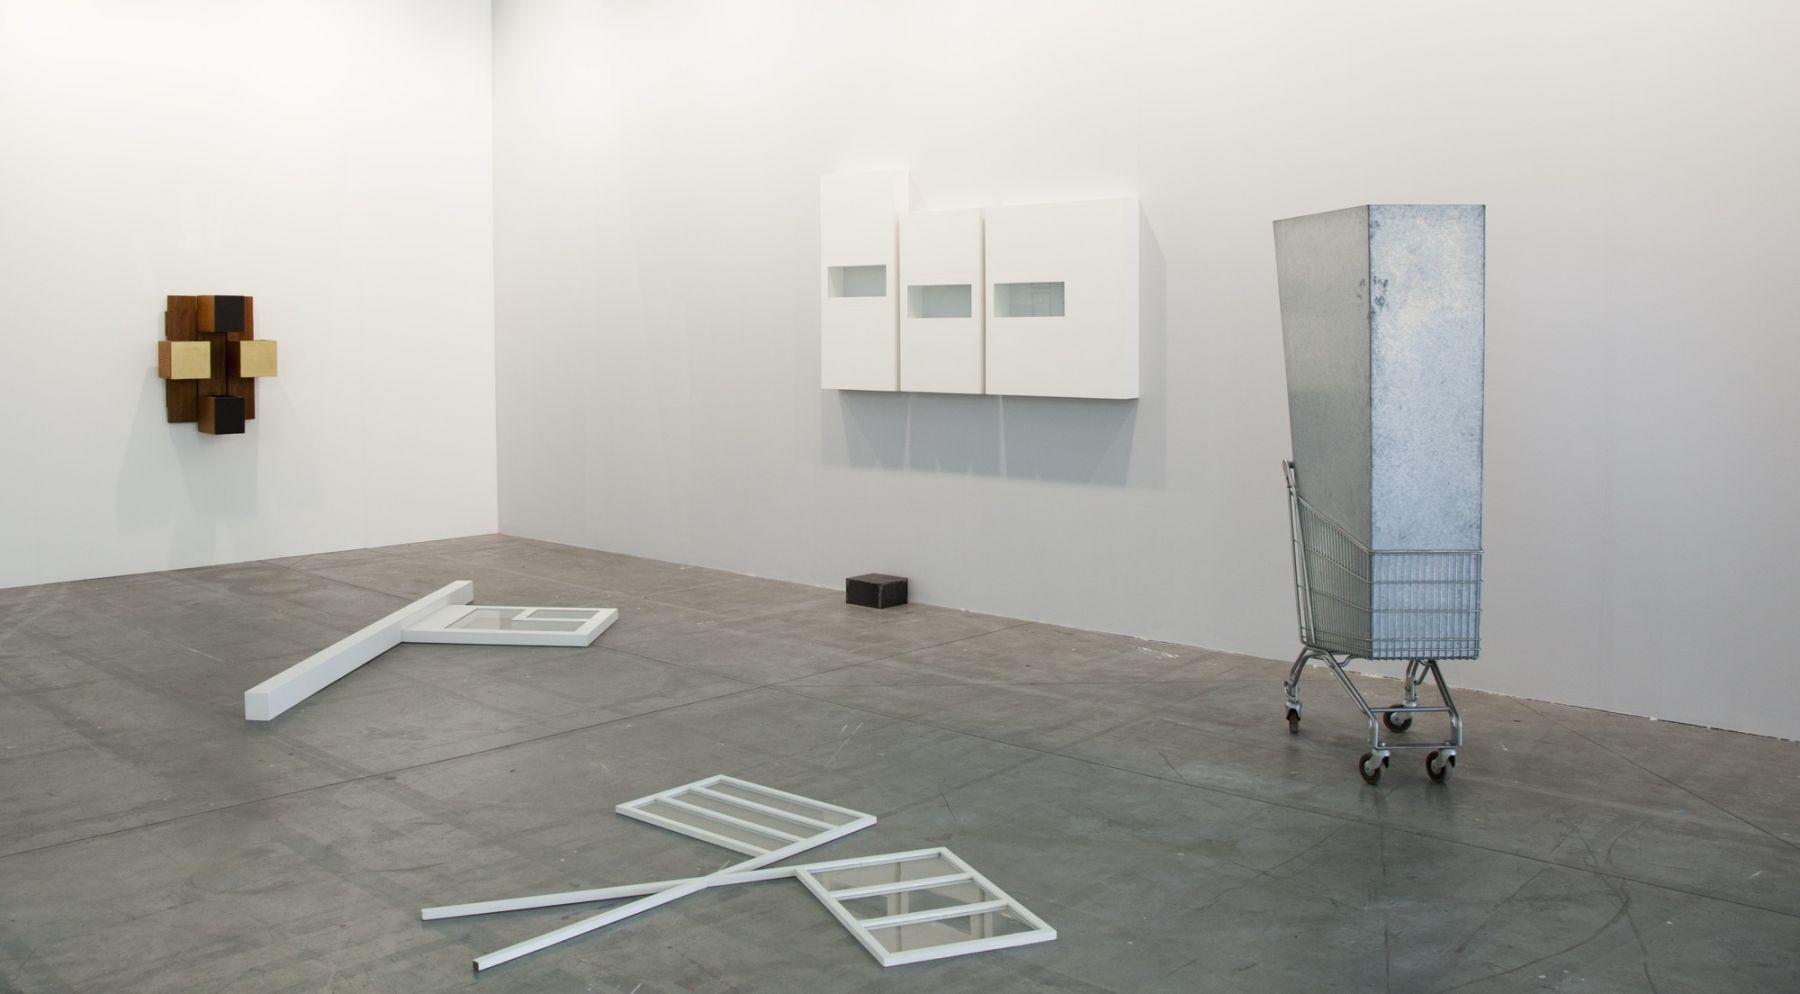 Artissima 2017, booth view, Marion Baruch, © Elena Perlino, courtesy Galerie Anne-Sarah Bénichou